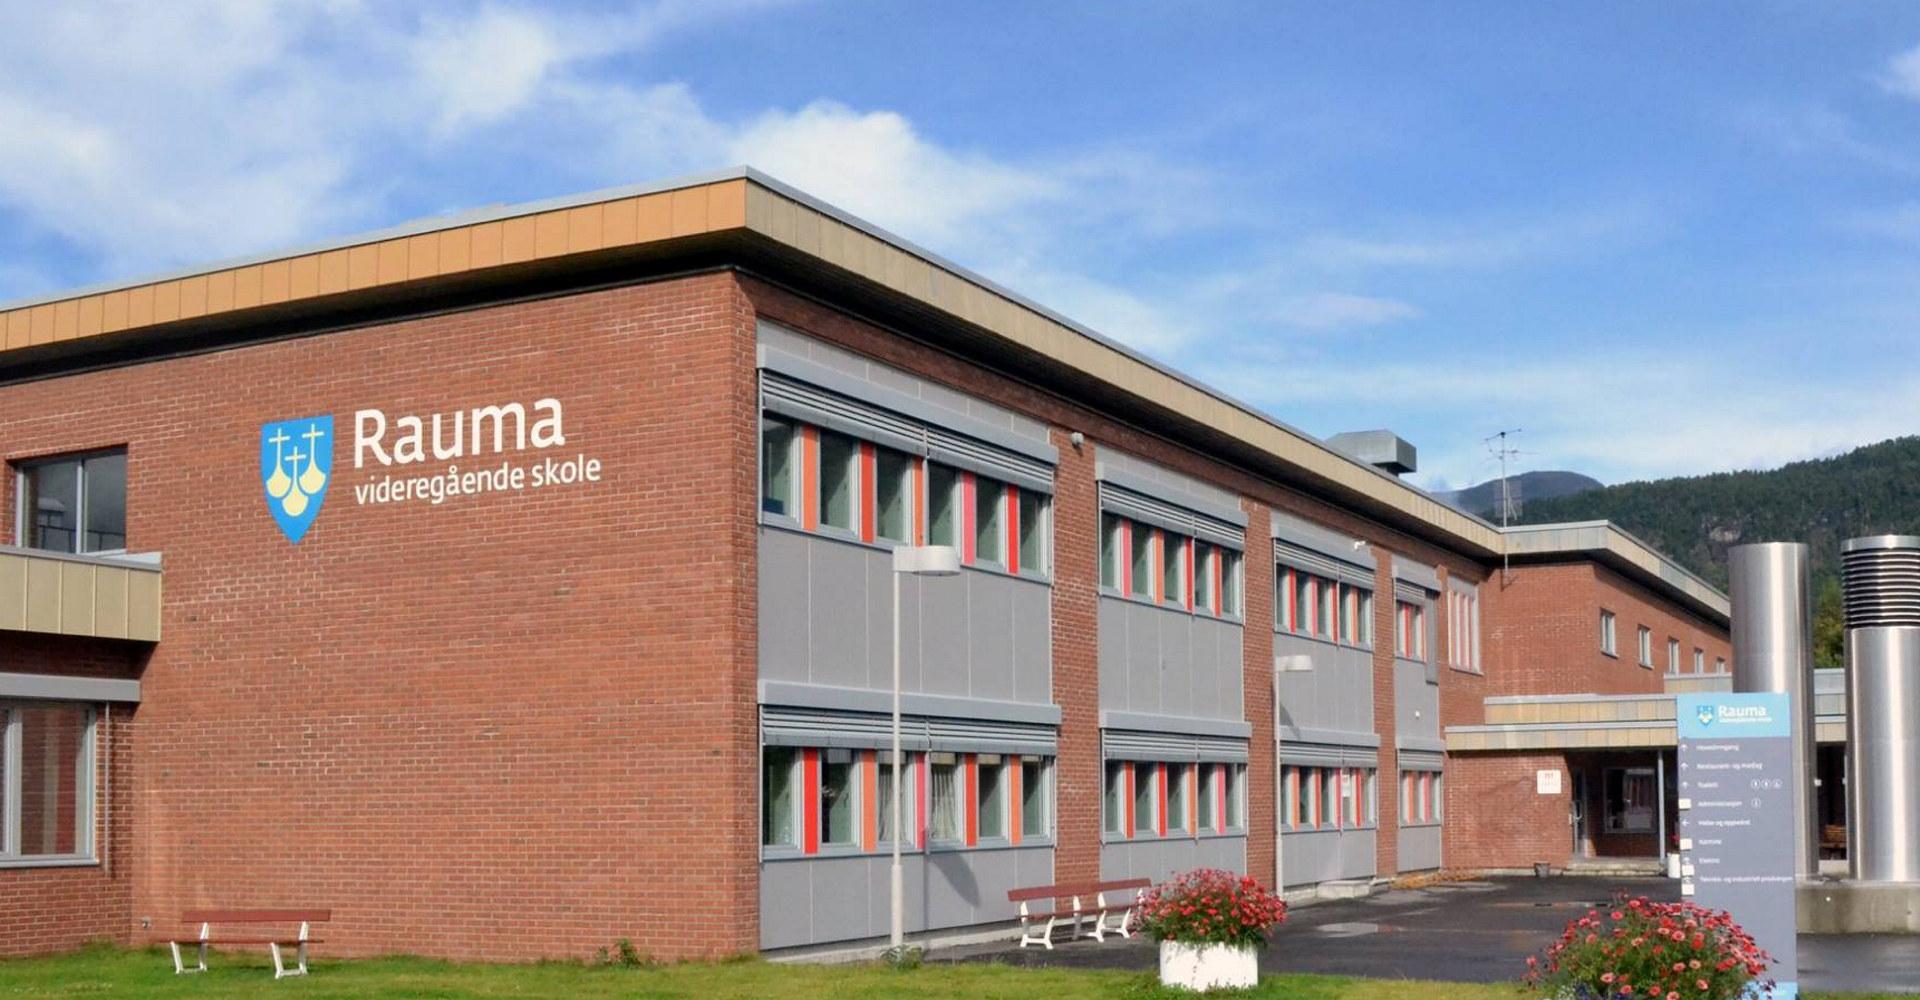 Foto: Rauma videregående skole